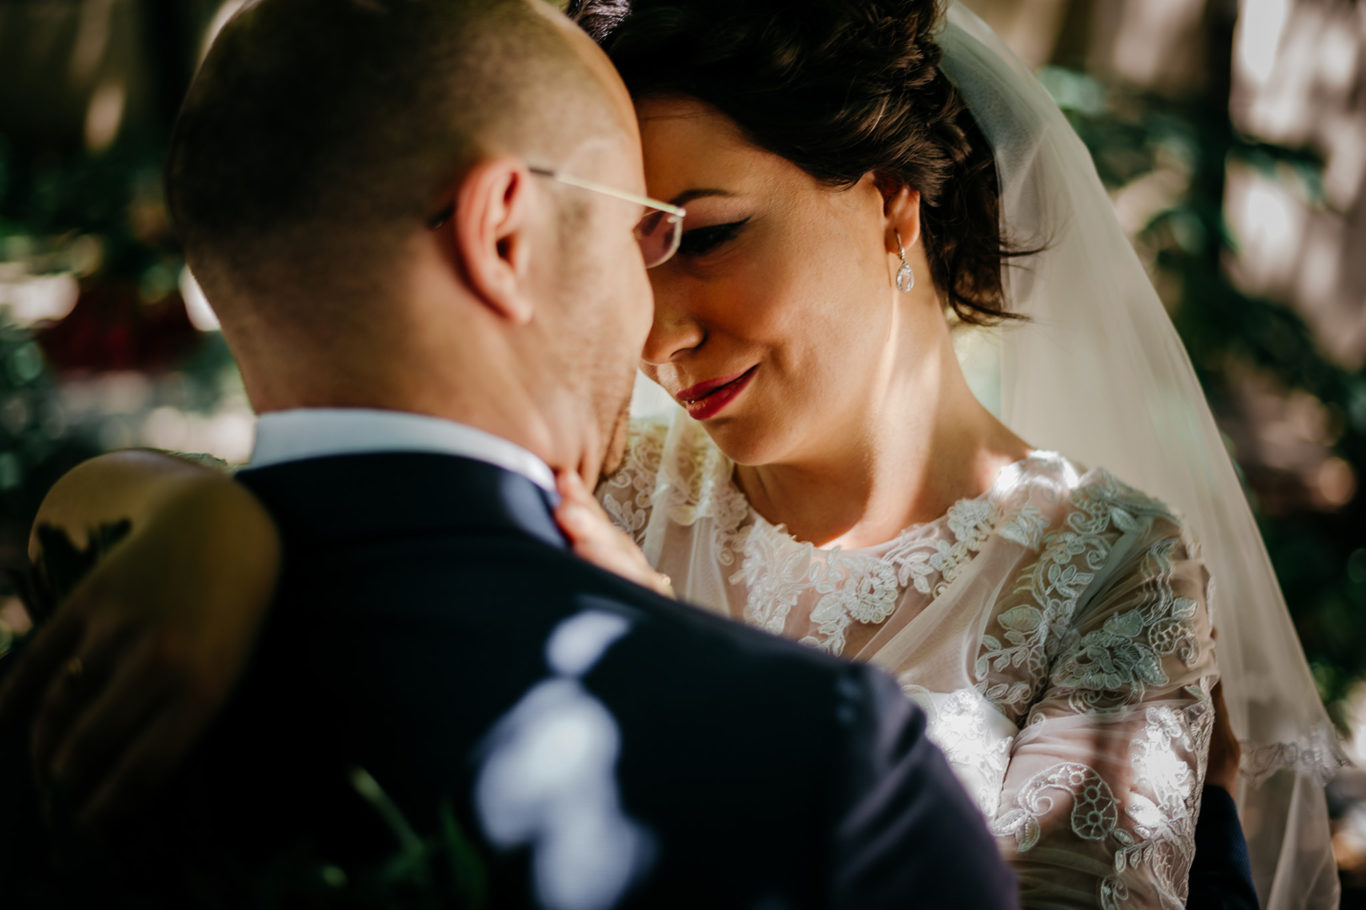 0323-fotografie-nunta-bucuresti-anca-george-fotograf-ciprian-dumitrescu-dsc_8372